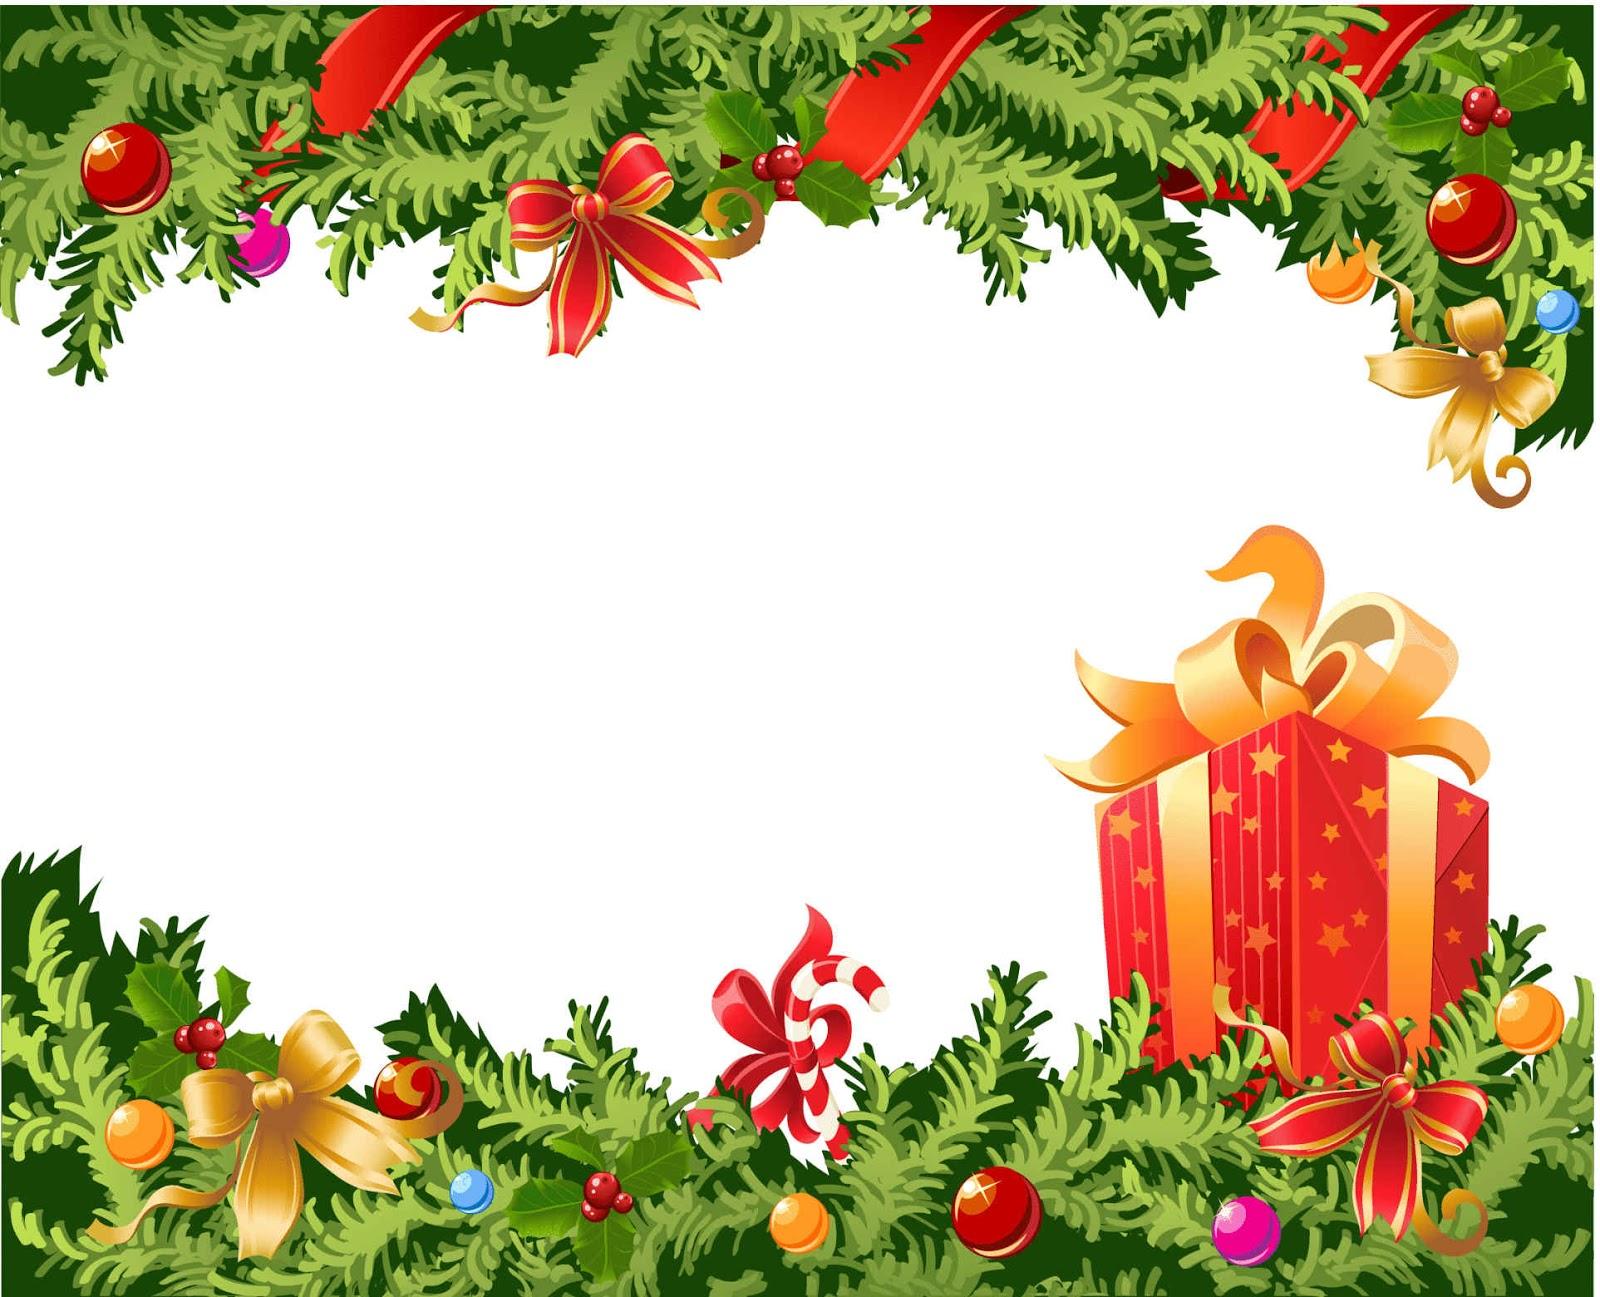 Tarjetas de Navidad para Imprimir Blog De Fotografias | Imagenes ...